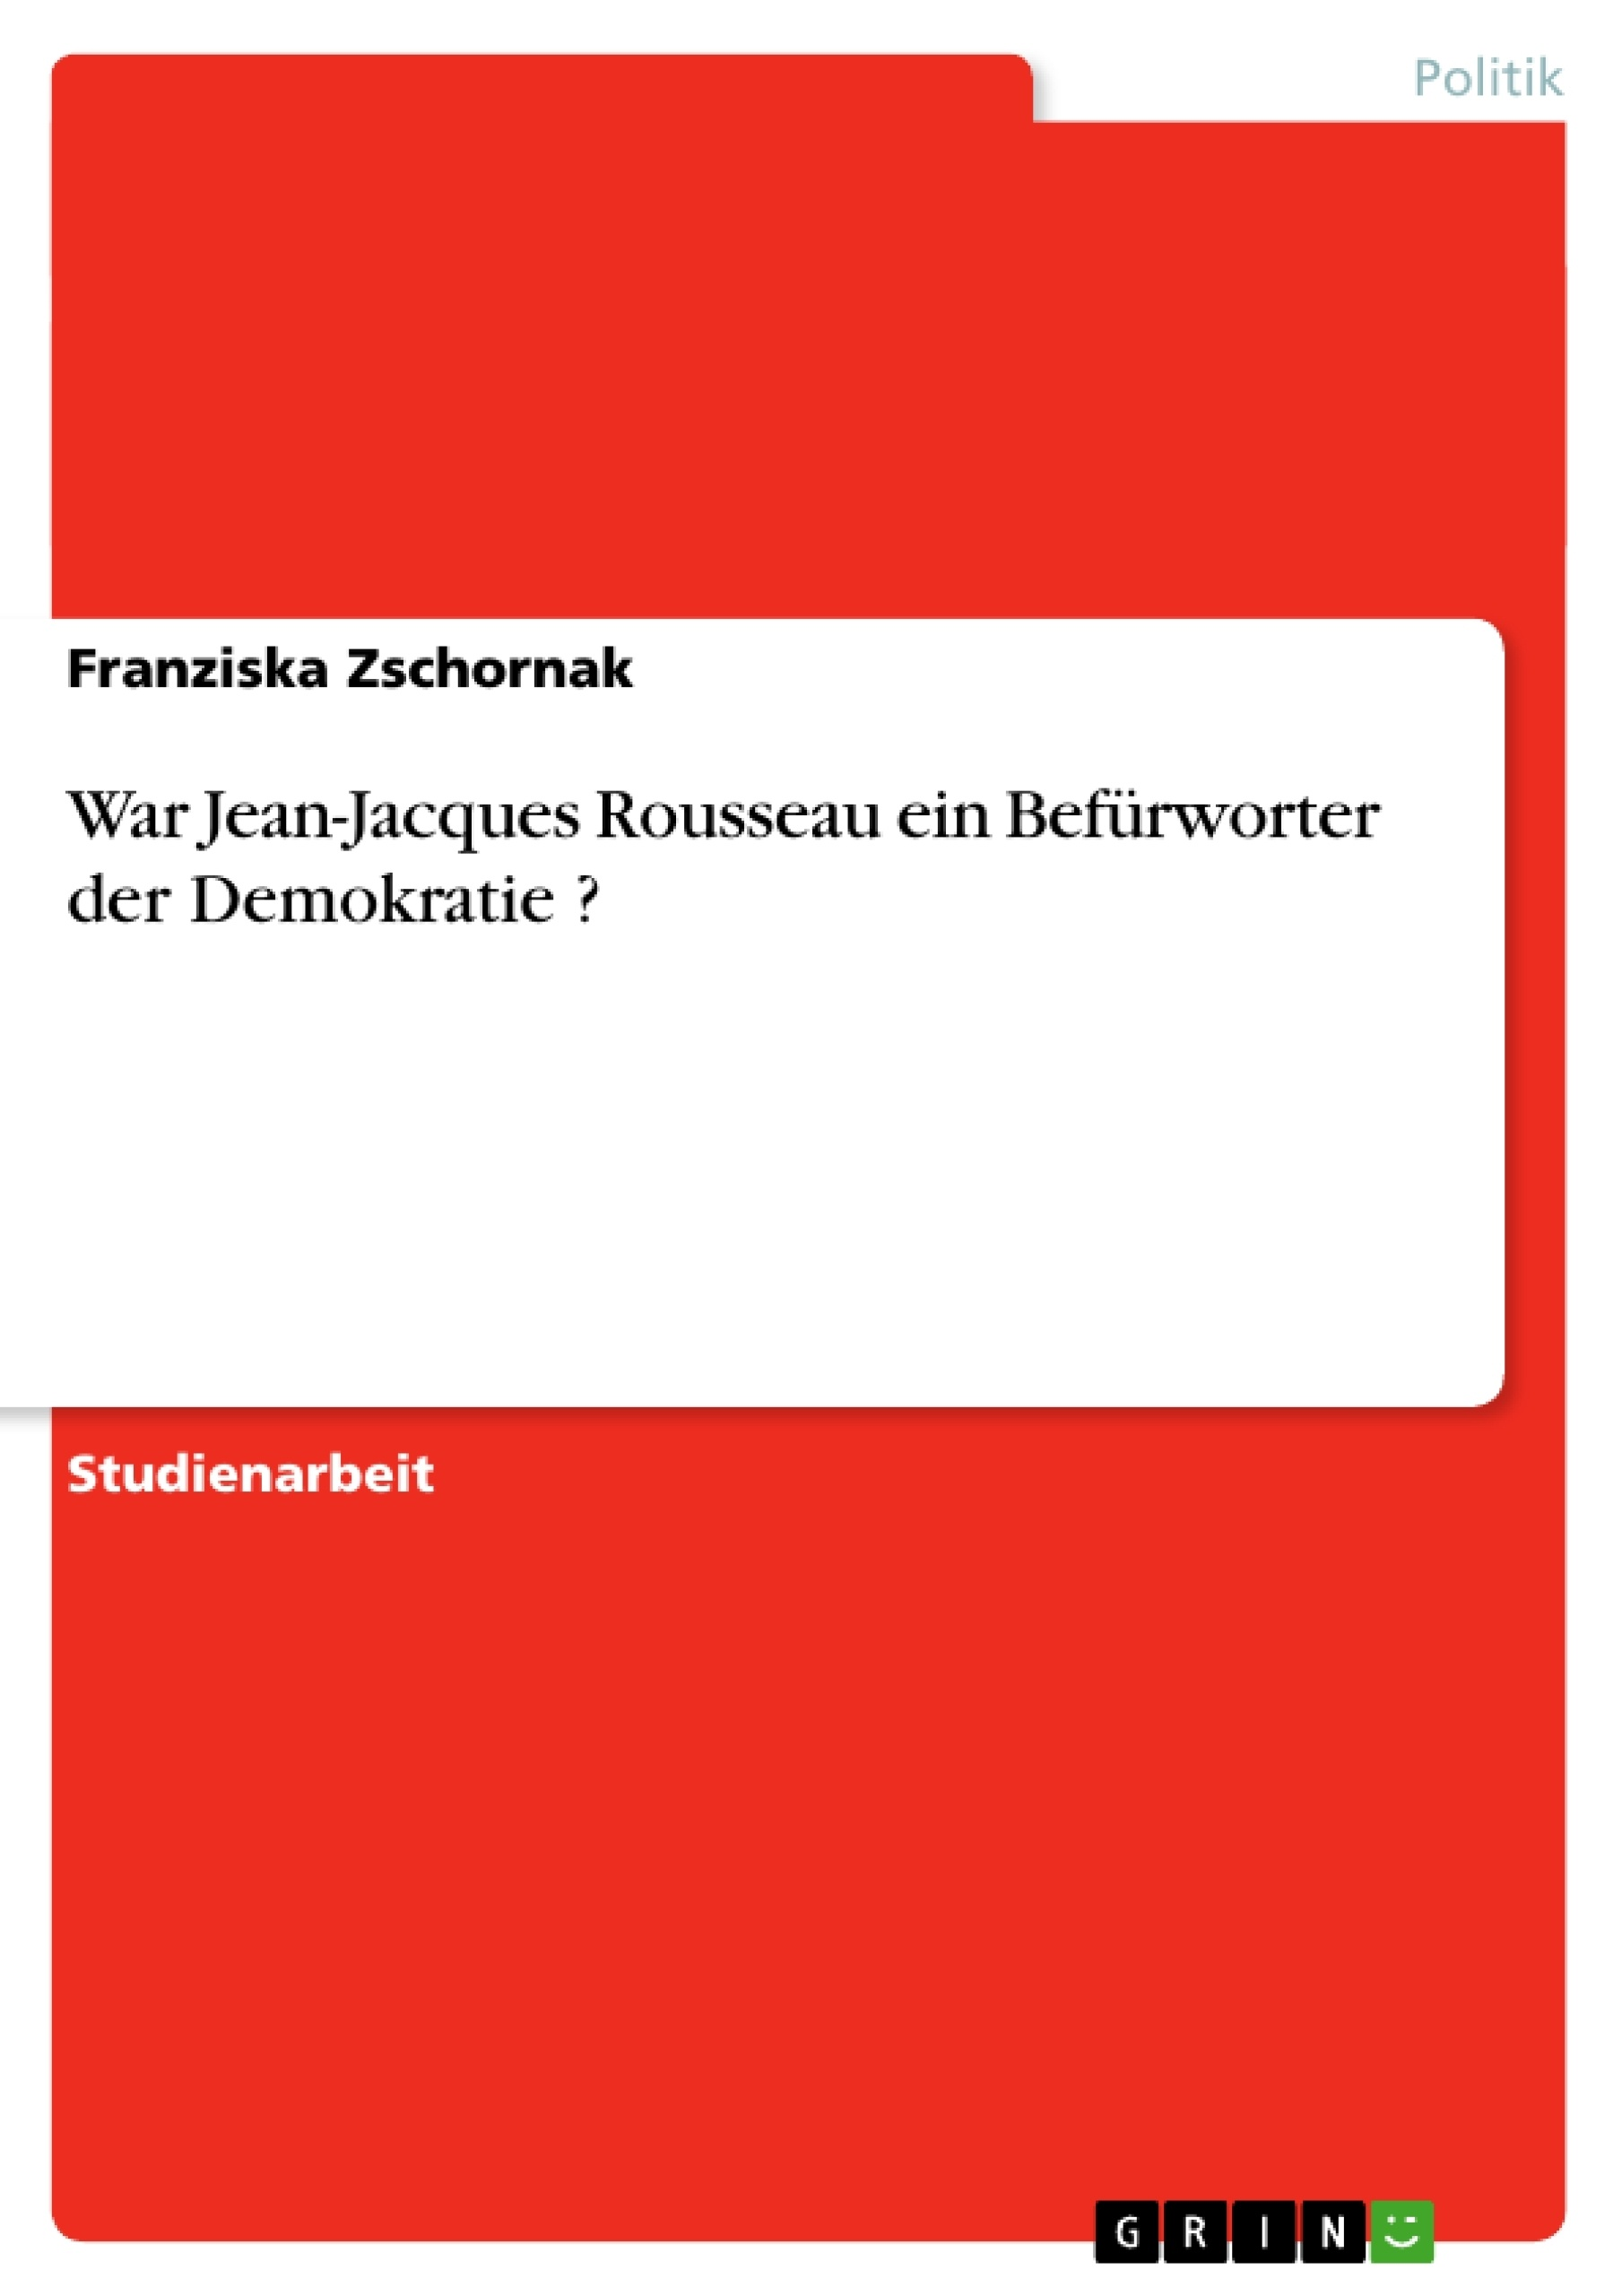 Titel: War Jean-Jacques Rousseau ein Befürworter der Demokratie ?